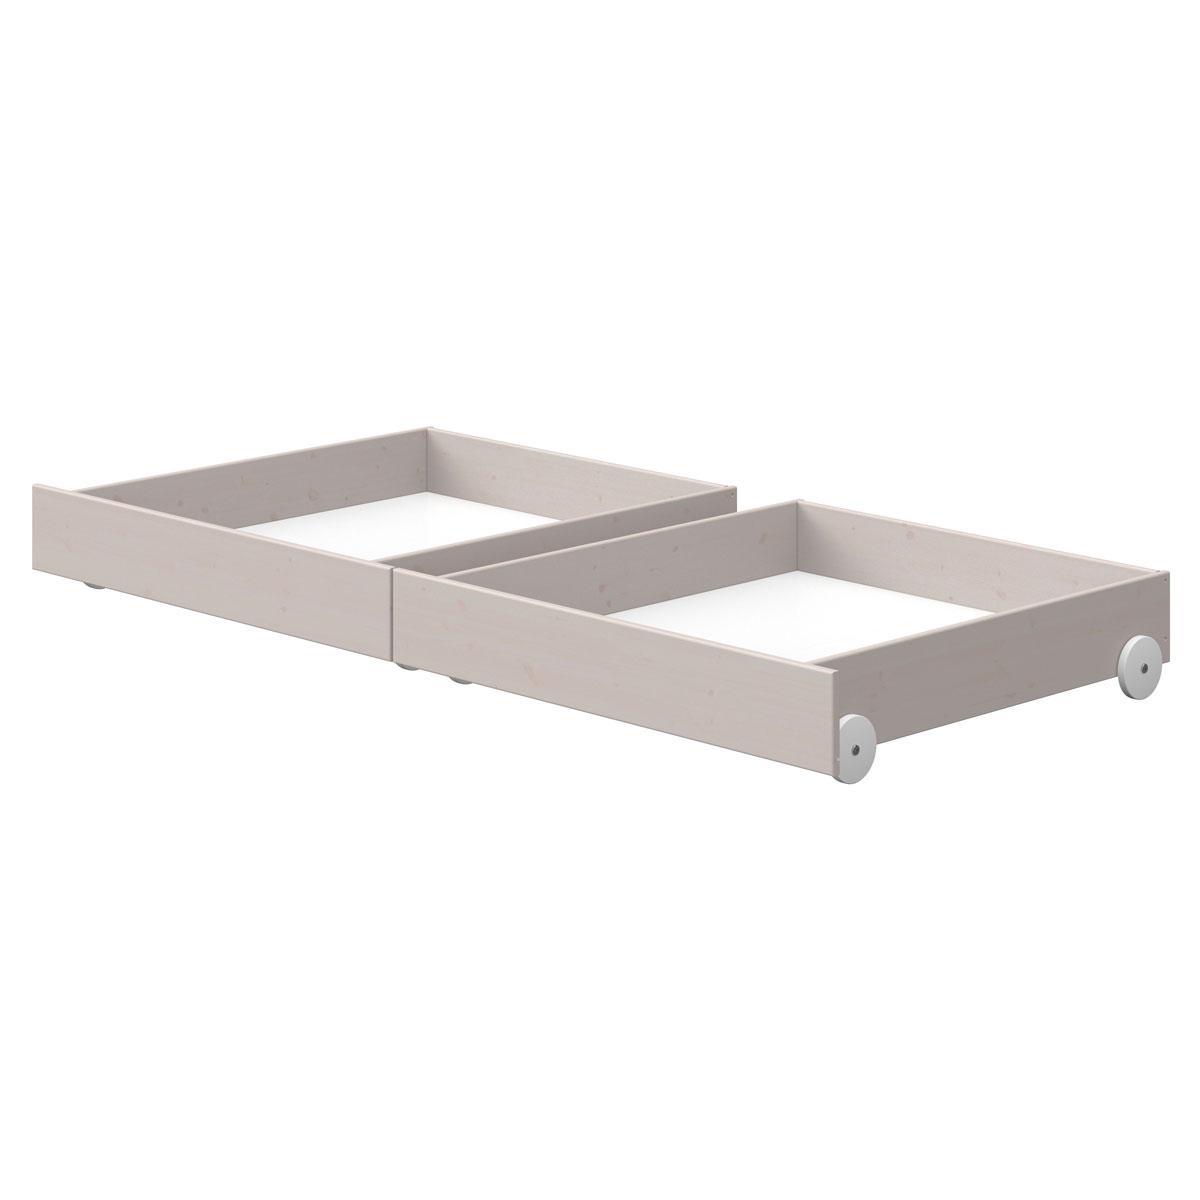 2 Schubladen Bett 90x190cm CLASSIC Flexa grey washed